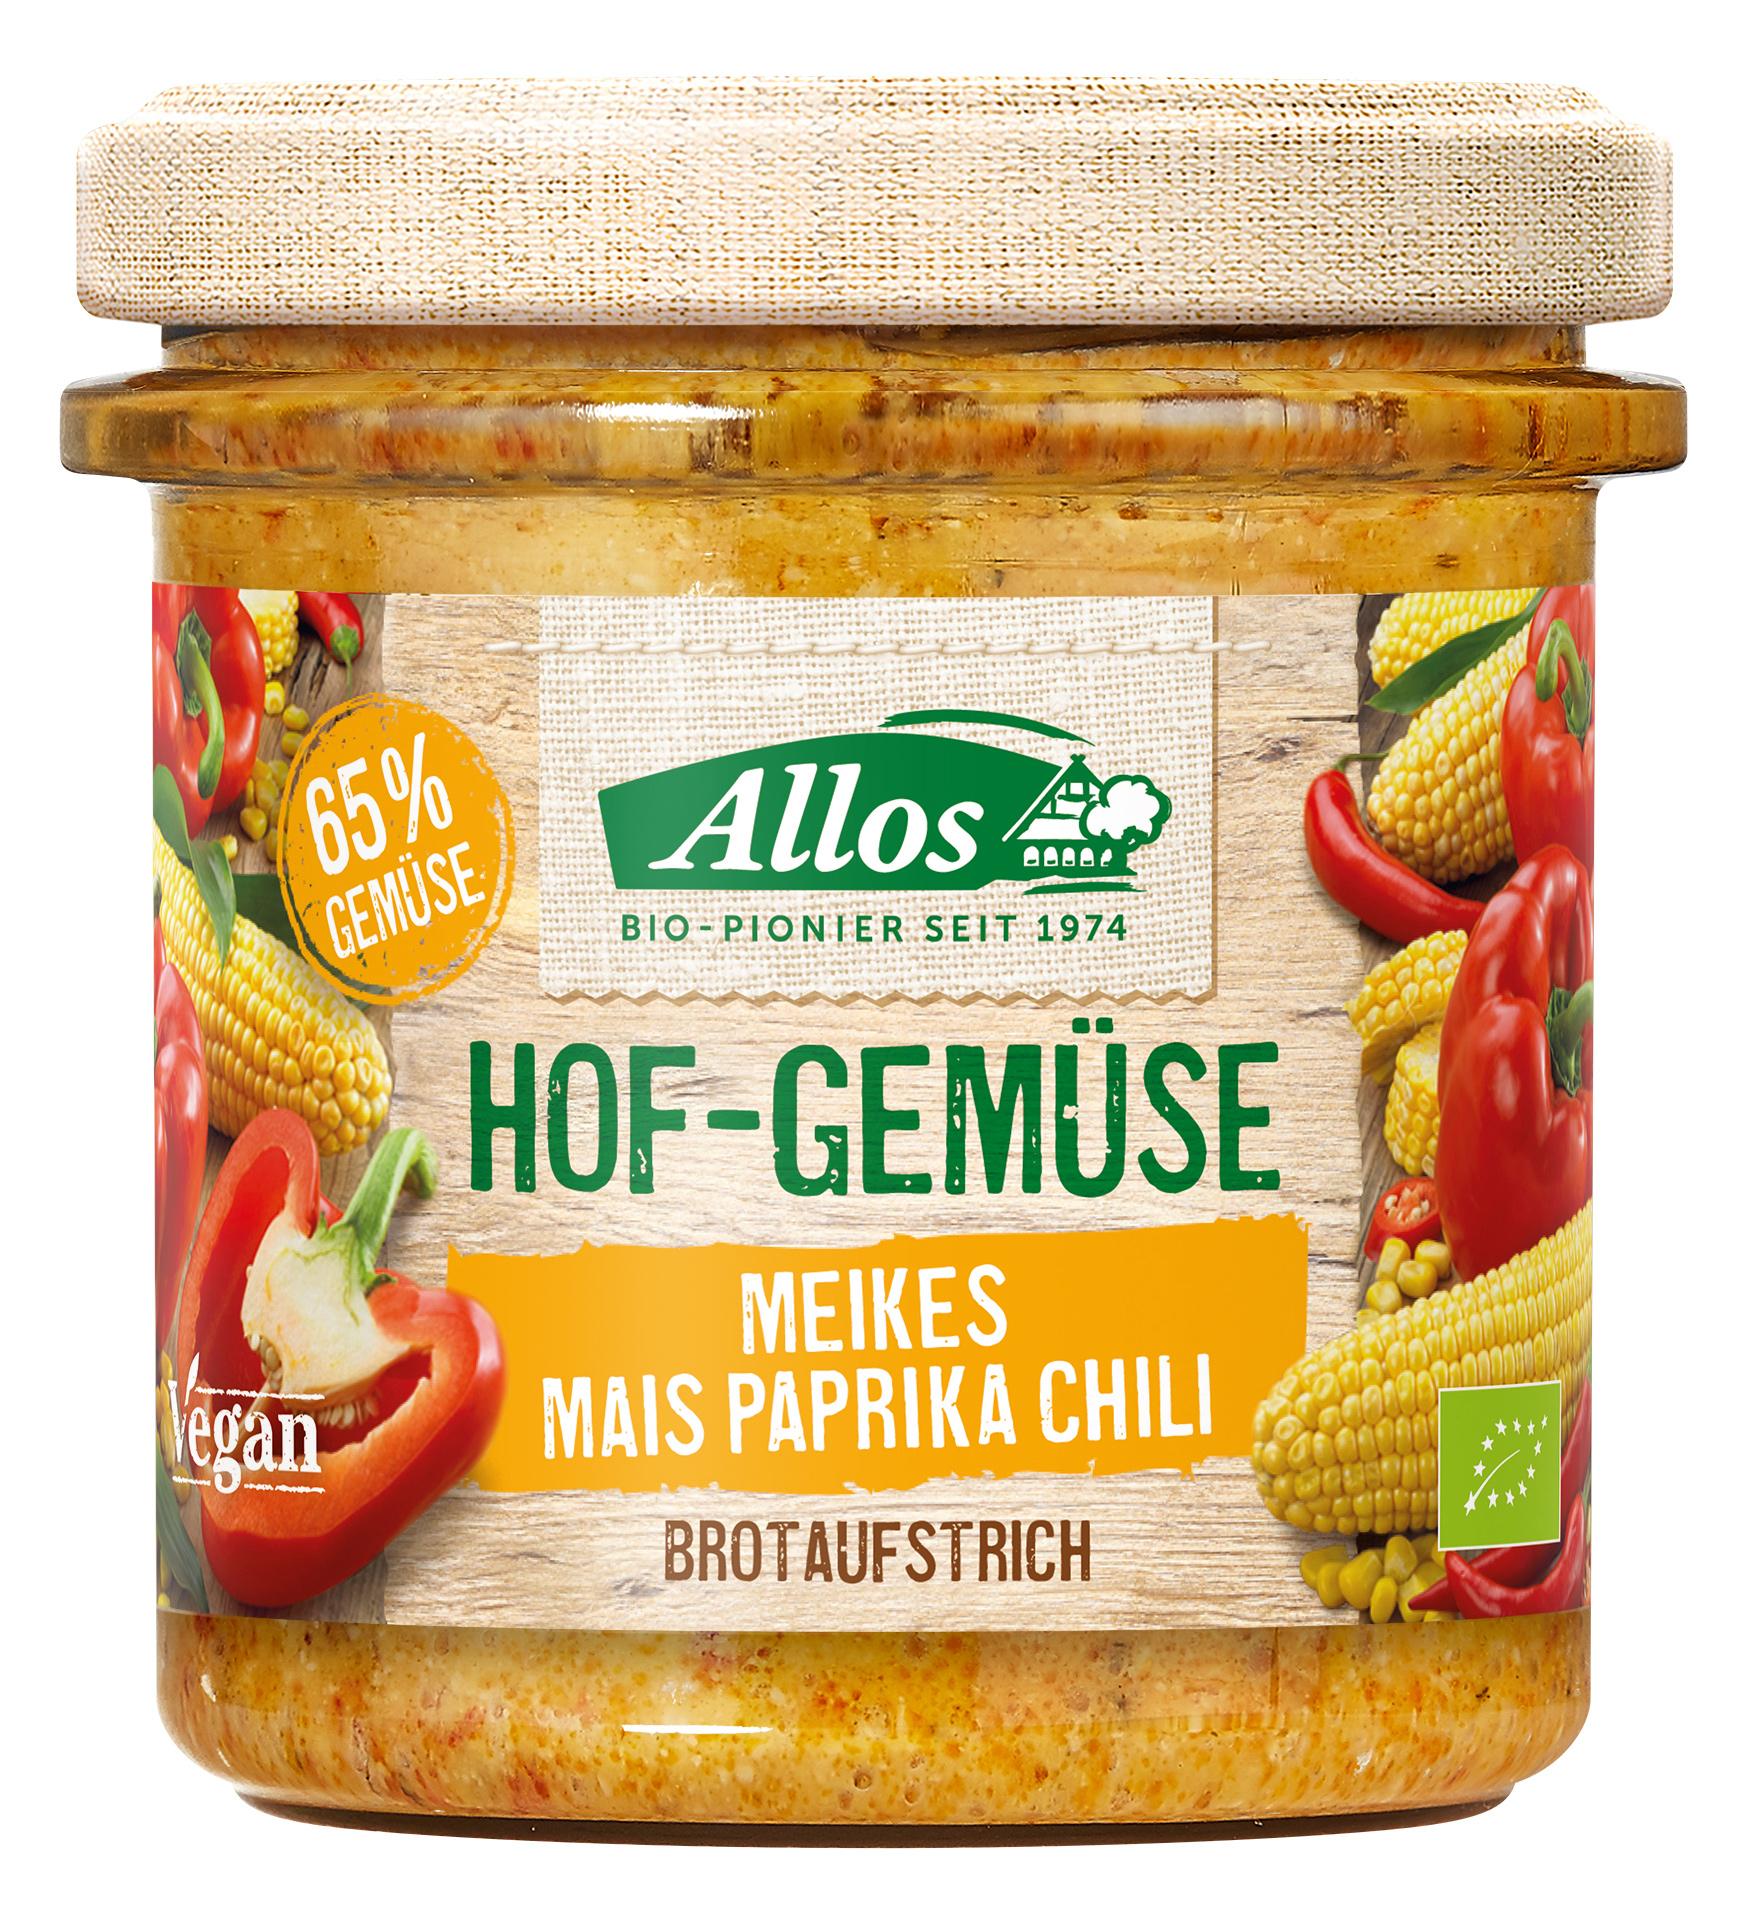 Bio Hof-Gemüse Meikes Mais Paprika Chili, 135 g